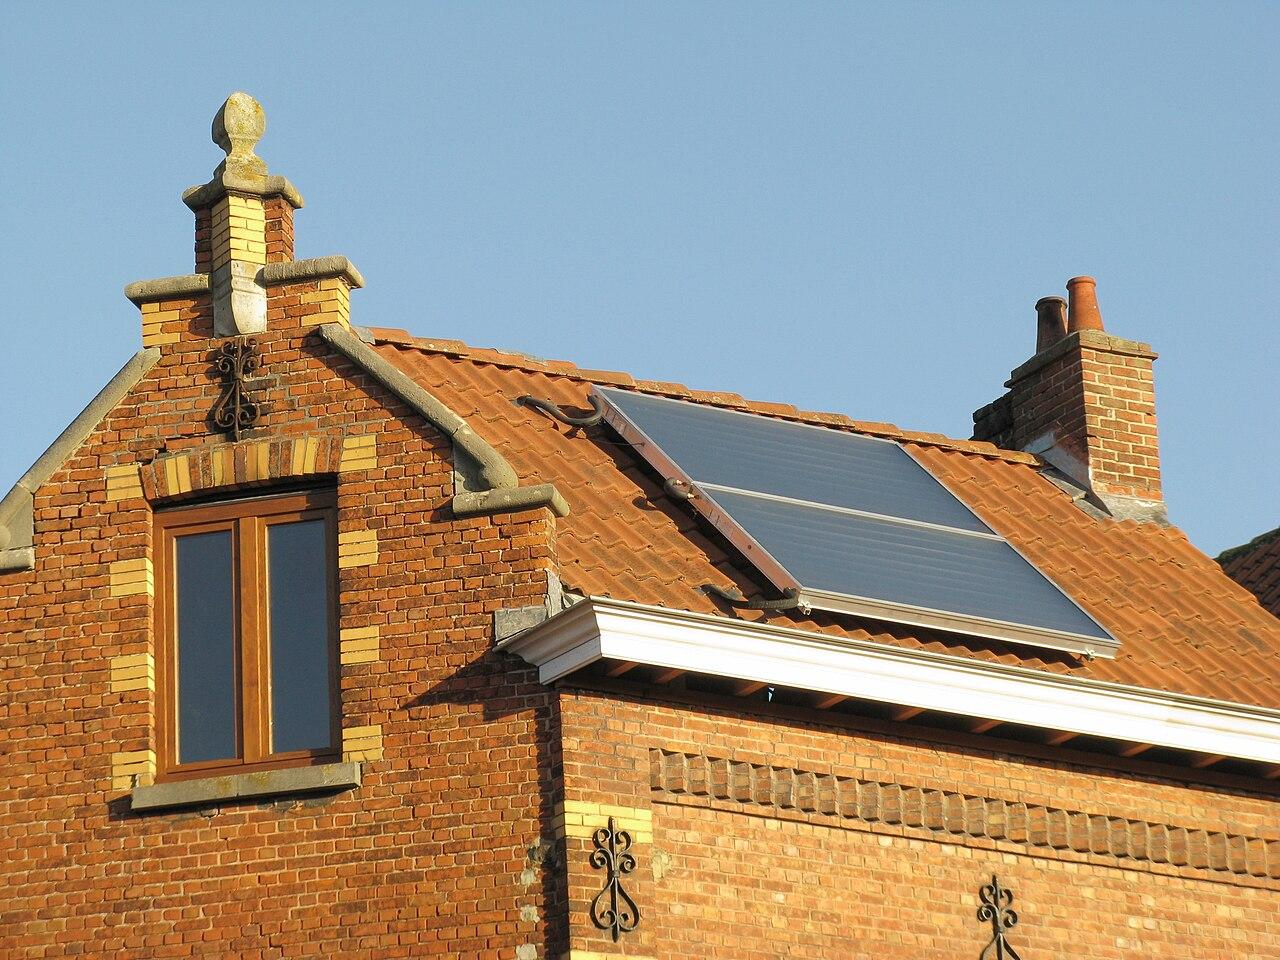 Stress Free Solar Panel Mounts For Tile Rooftops Shine